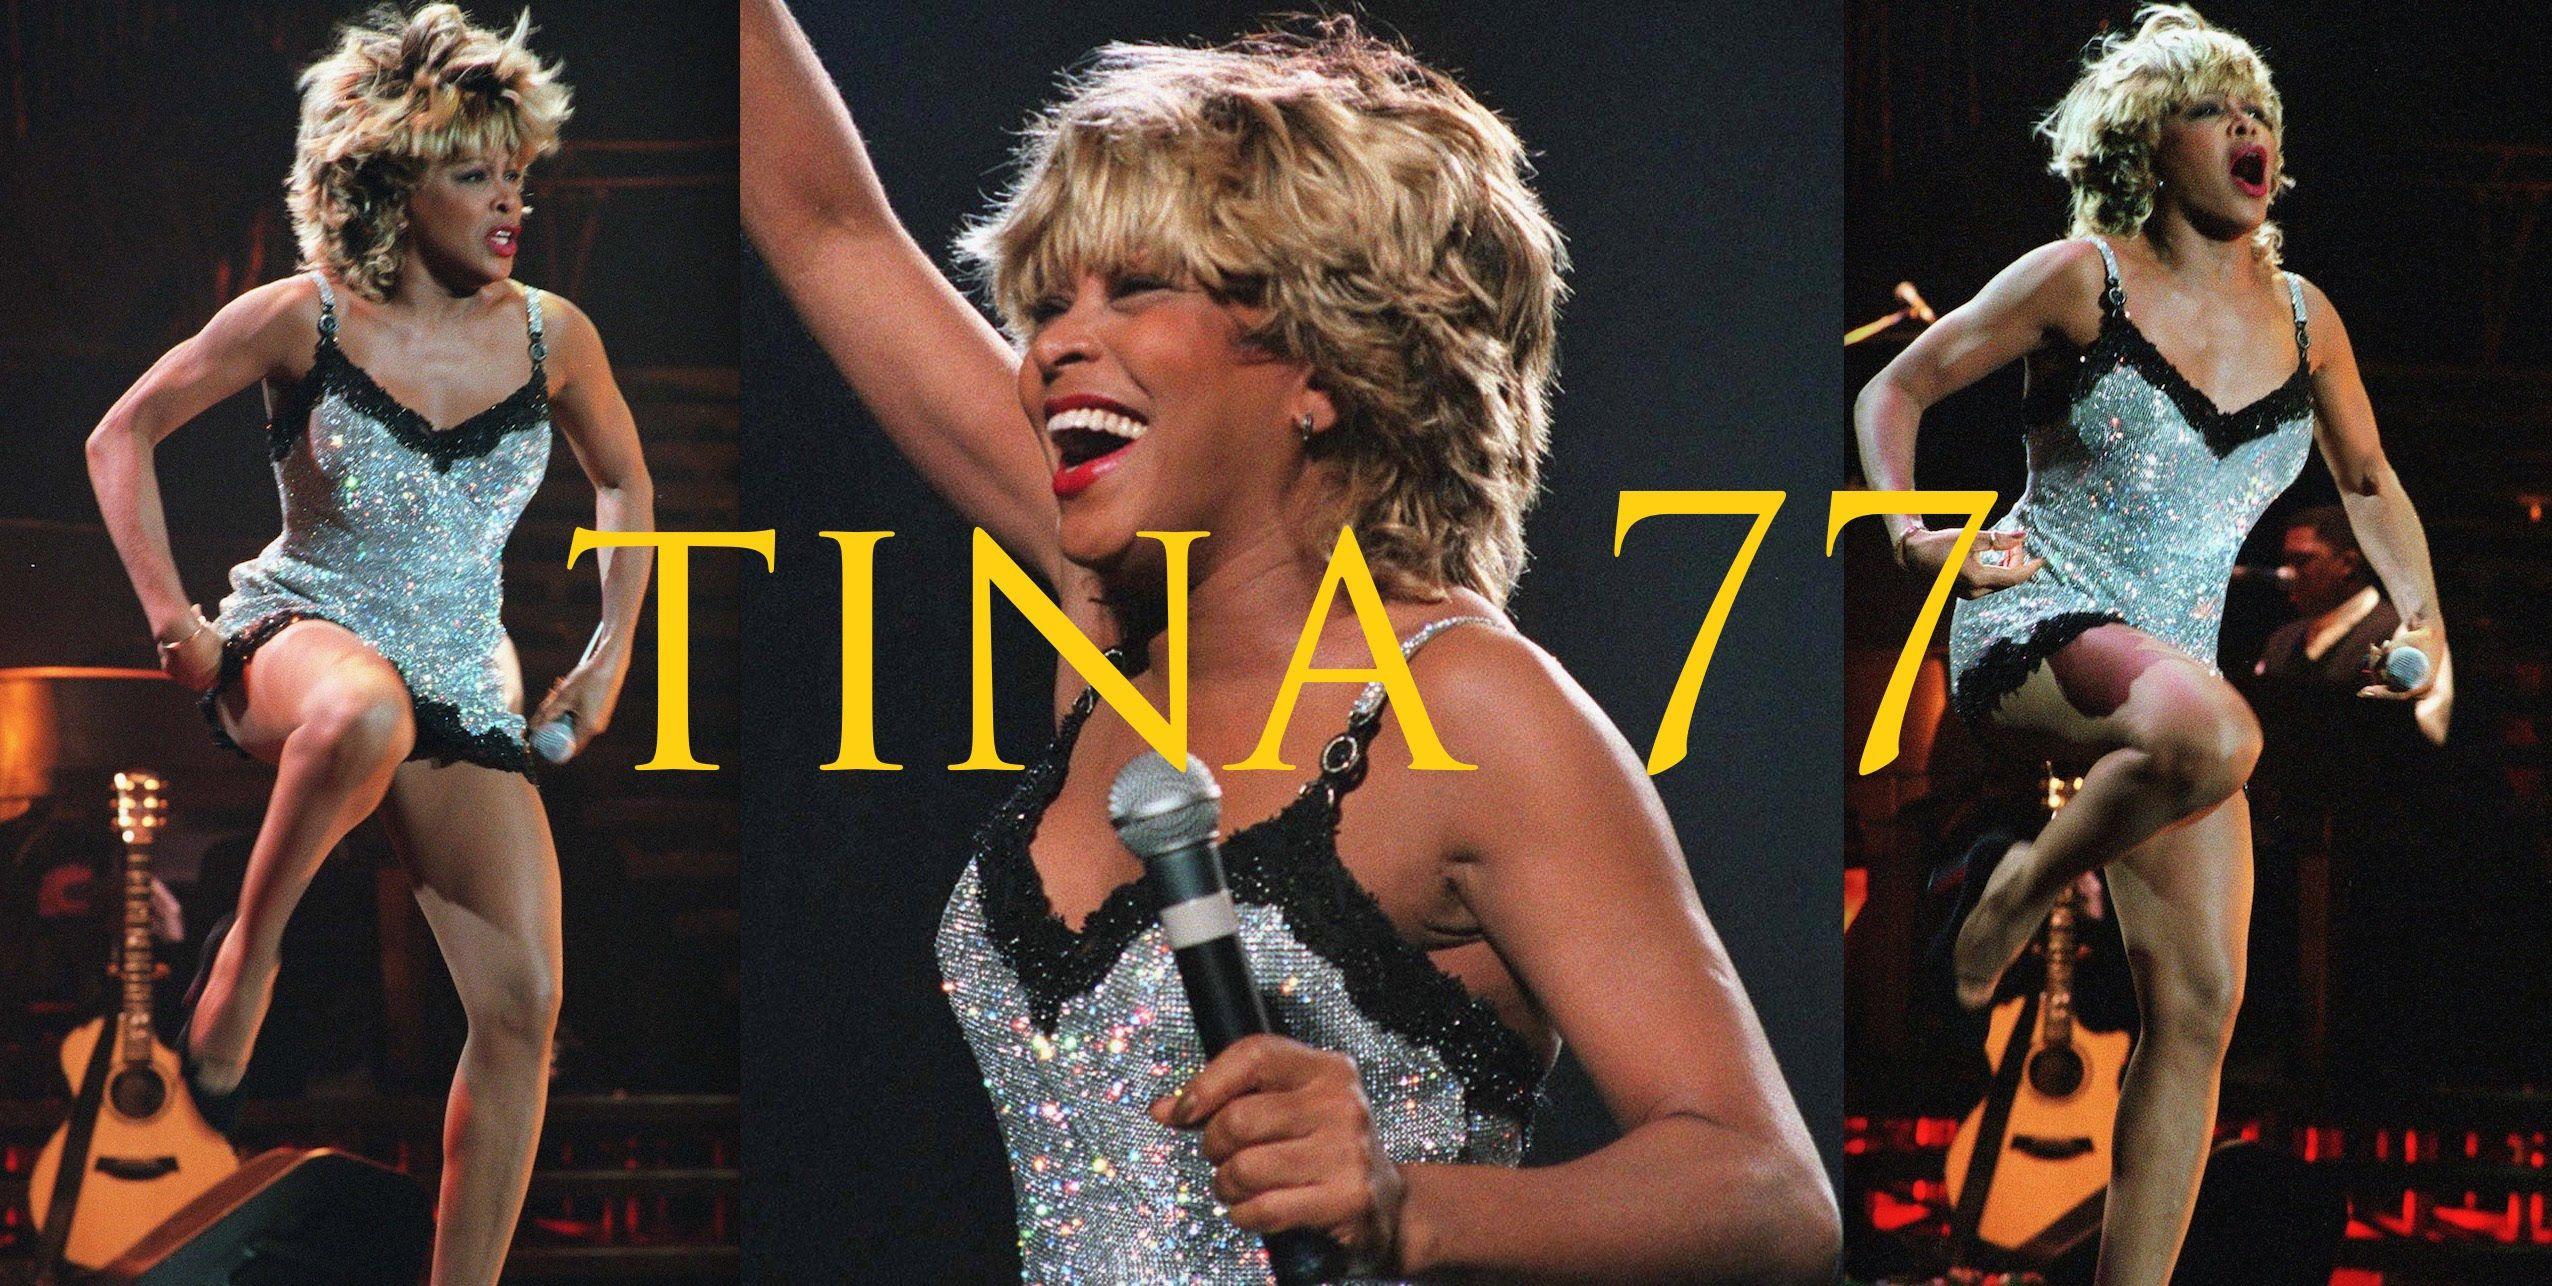 Tina77 Tina Turner Fans Birthday Party Trailer 2016 Muziek